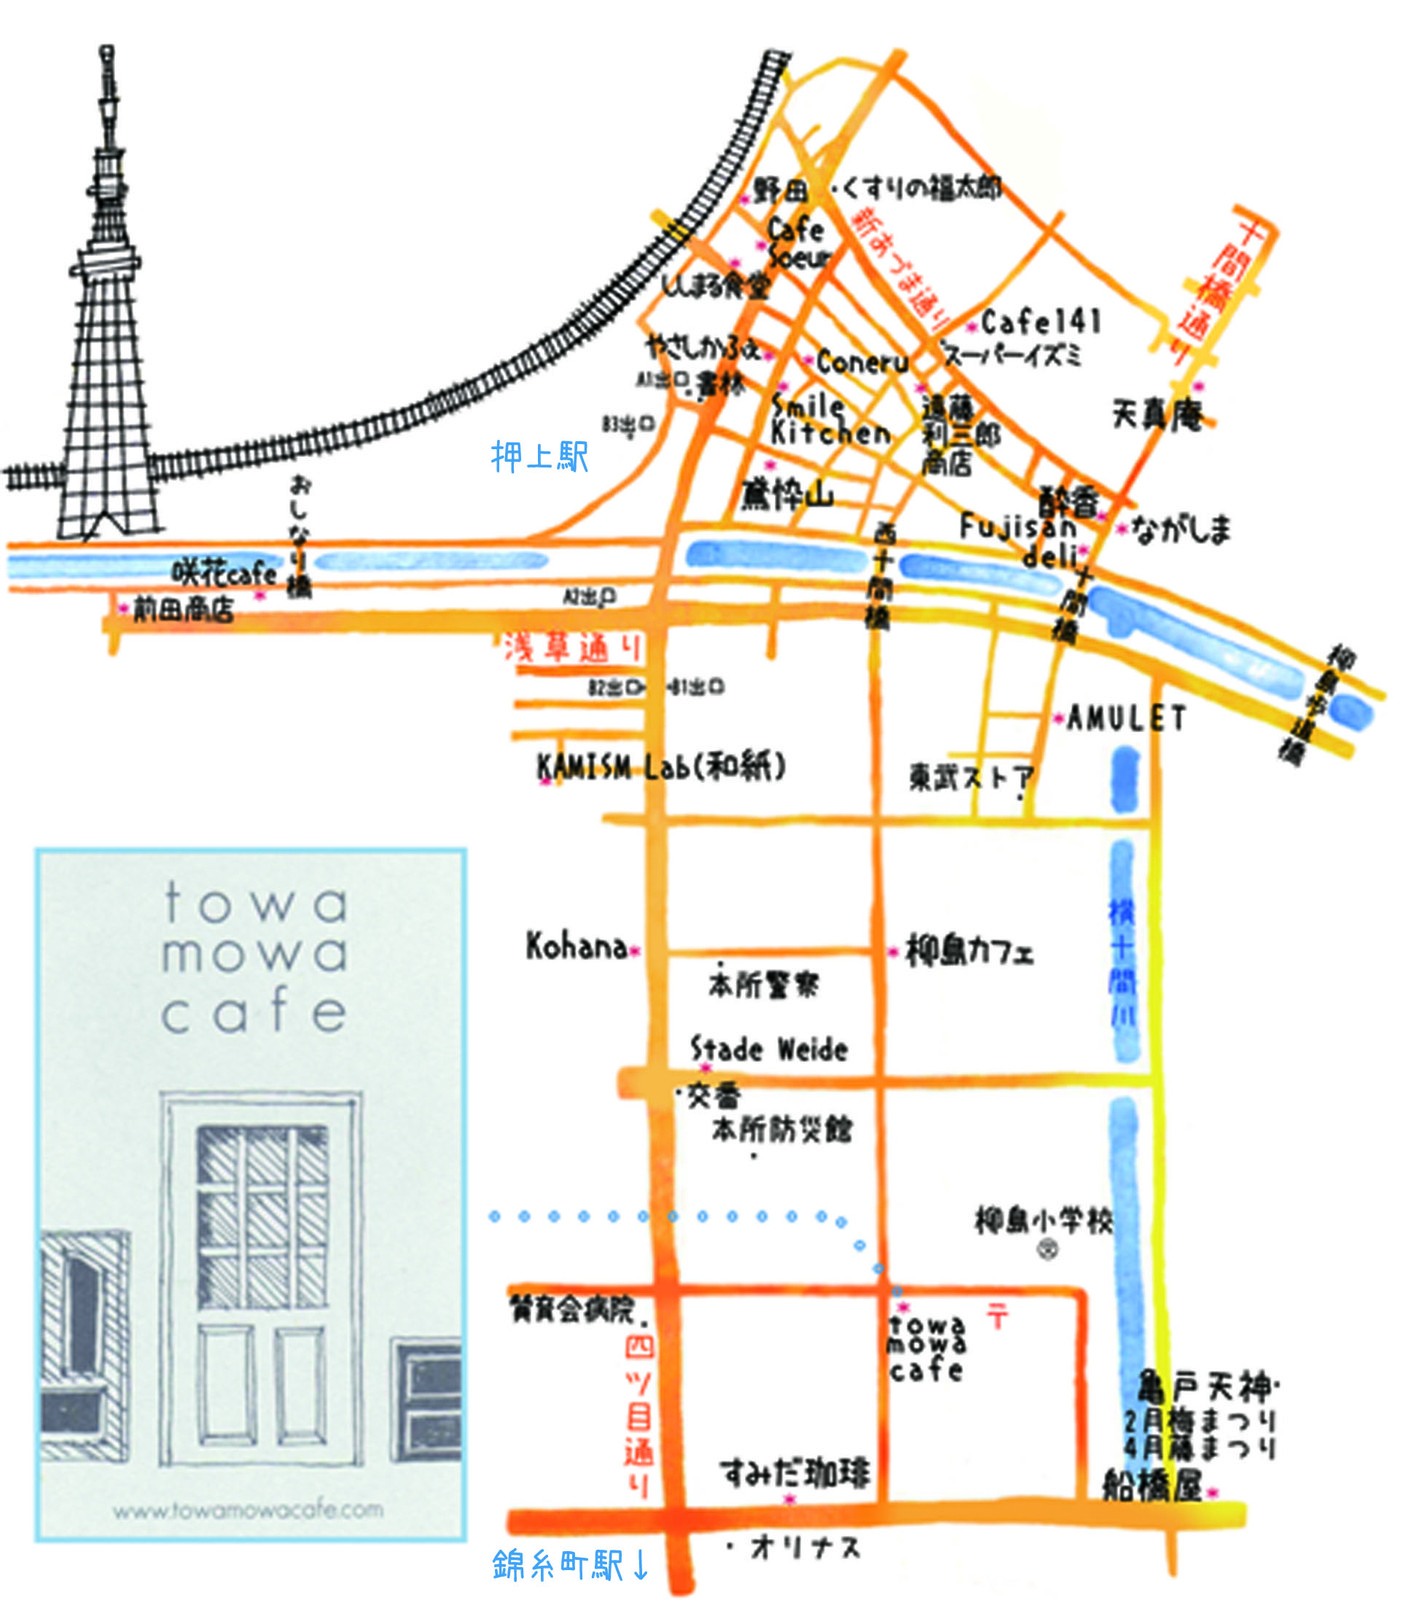 Towamowacafe_2